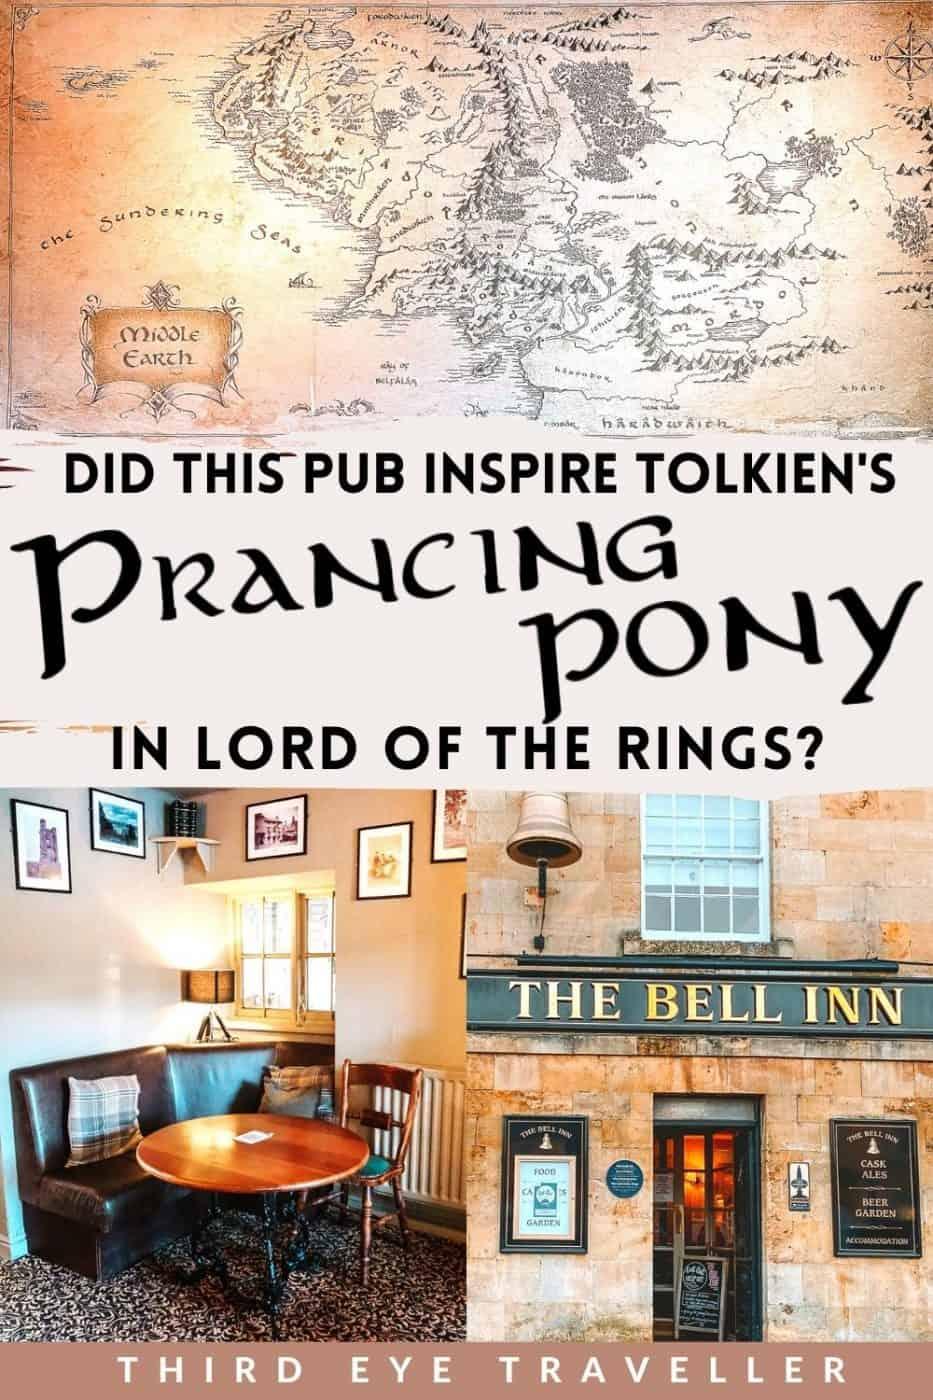 The Bell Inn Moreton in Marsh Tolkien Bree Prancing Pony